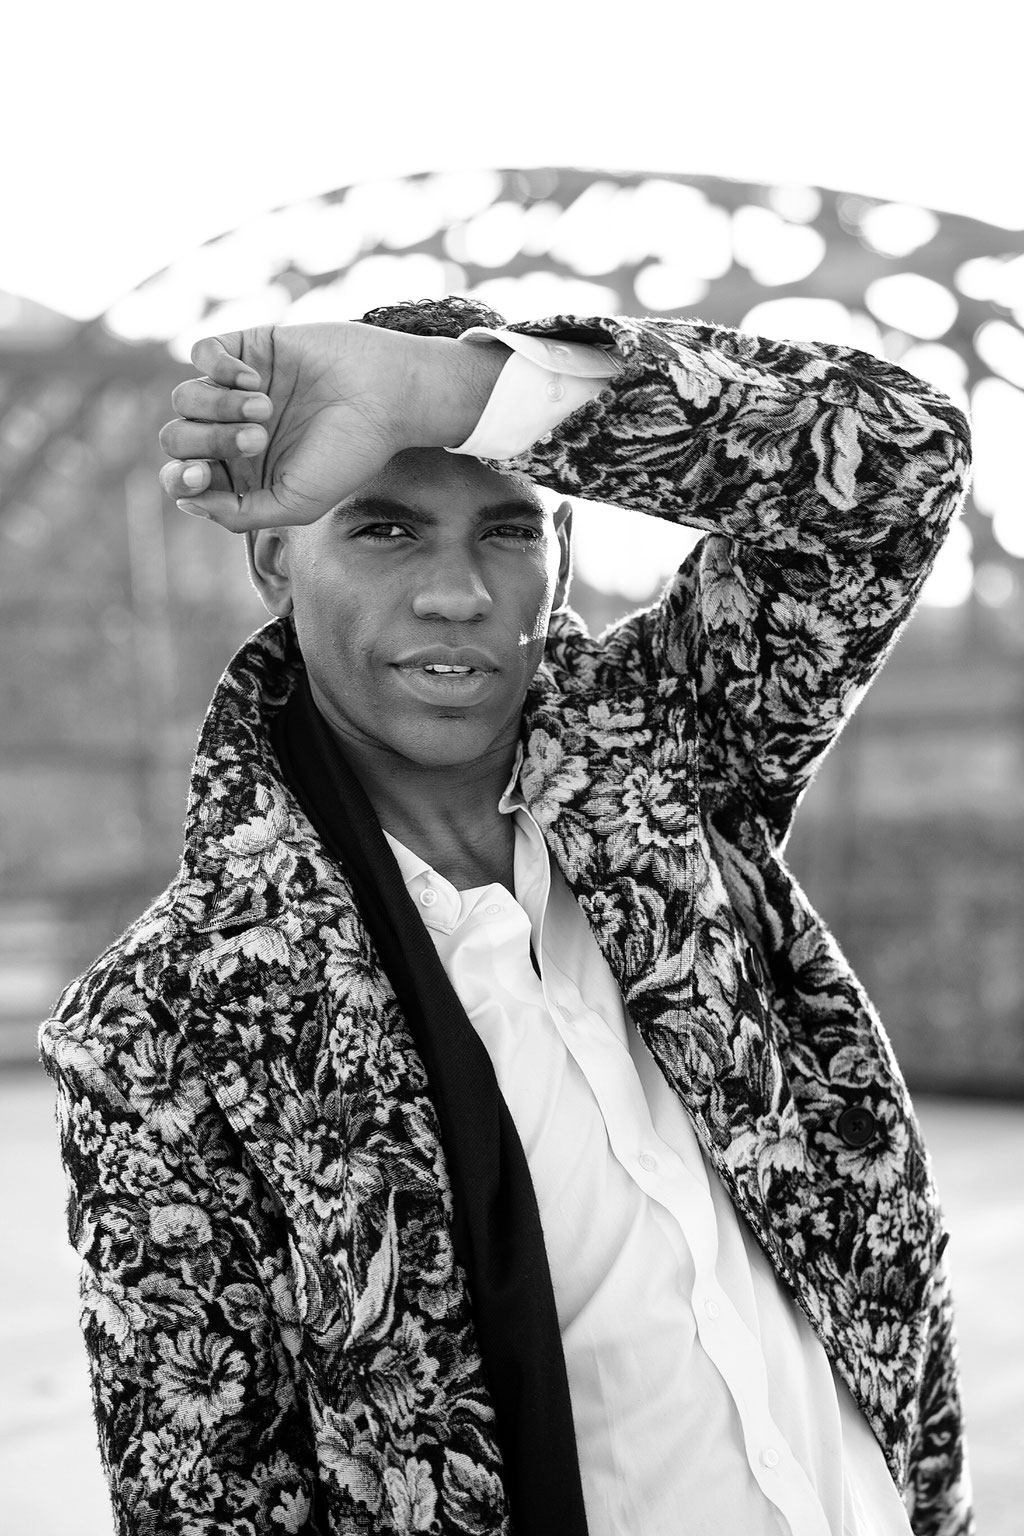 Ray Yusuf - Unternehmer & Fashion Model - Frankfurt am Main - Photo by Melina Johannsen